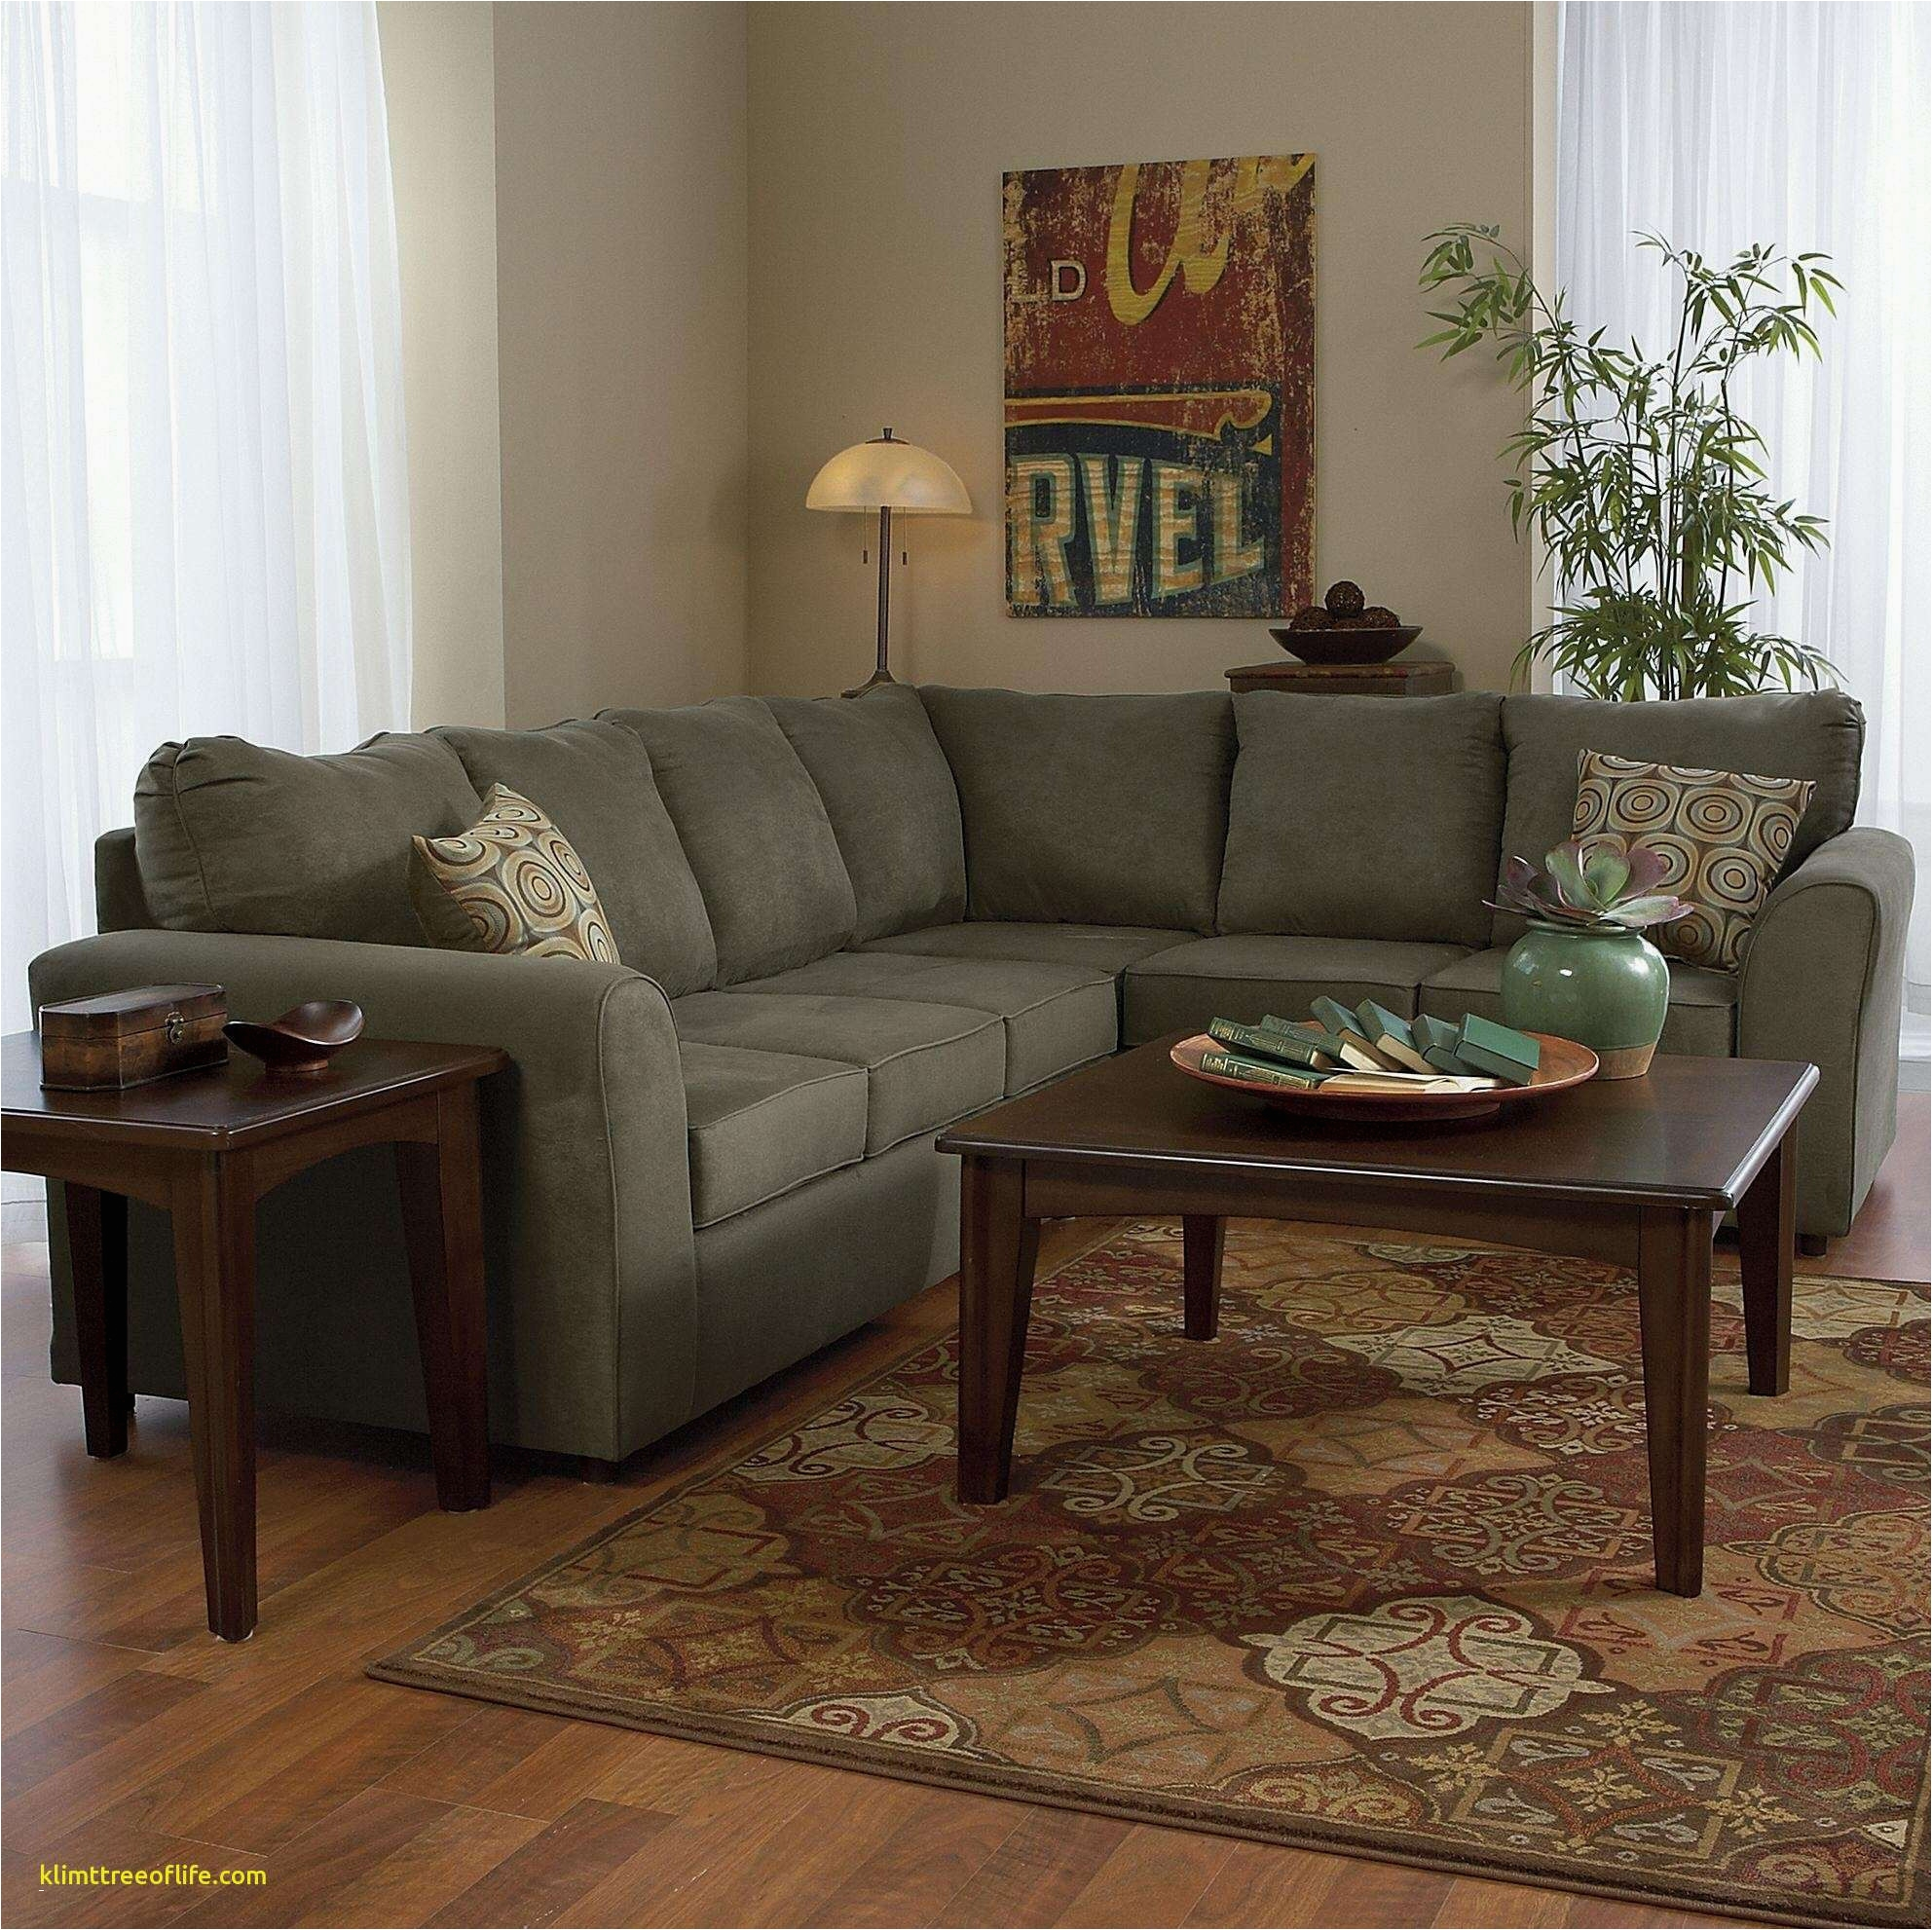 second hand bedroom furniture fresh best bedroom chairs unique best bedroom furniture deals beds 0d stock